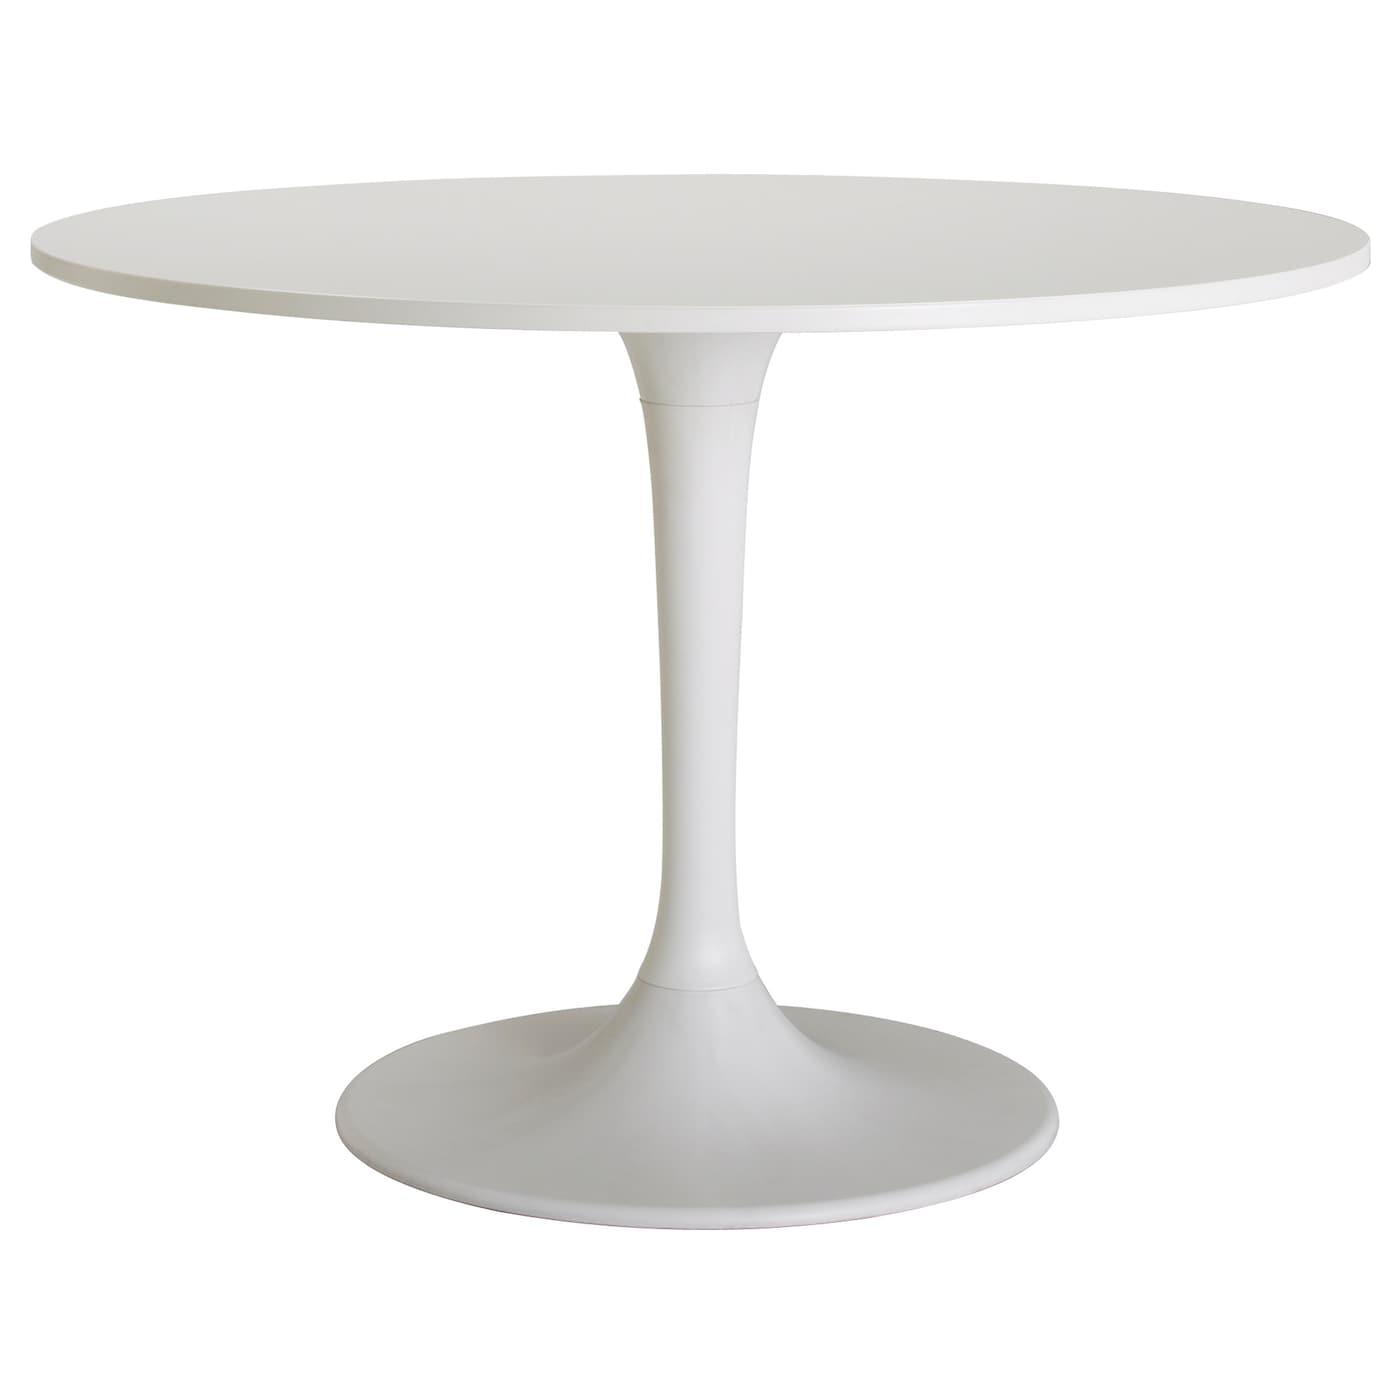 Witte Ronde Keukentafel.Docksta Tafel Wit 105 Cm Ikea